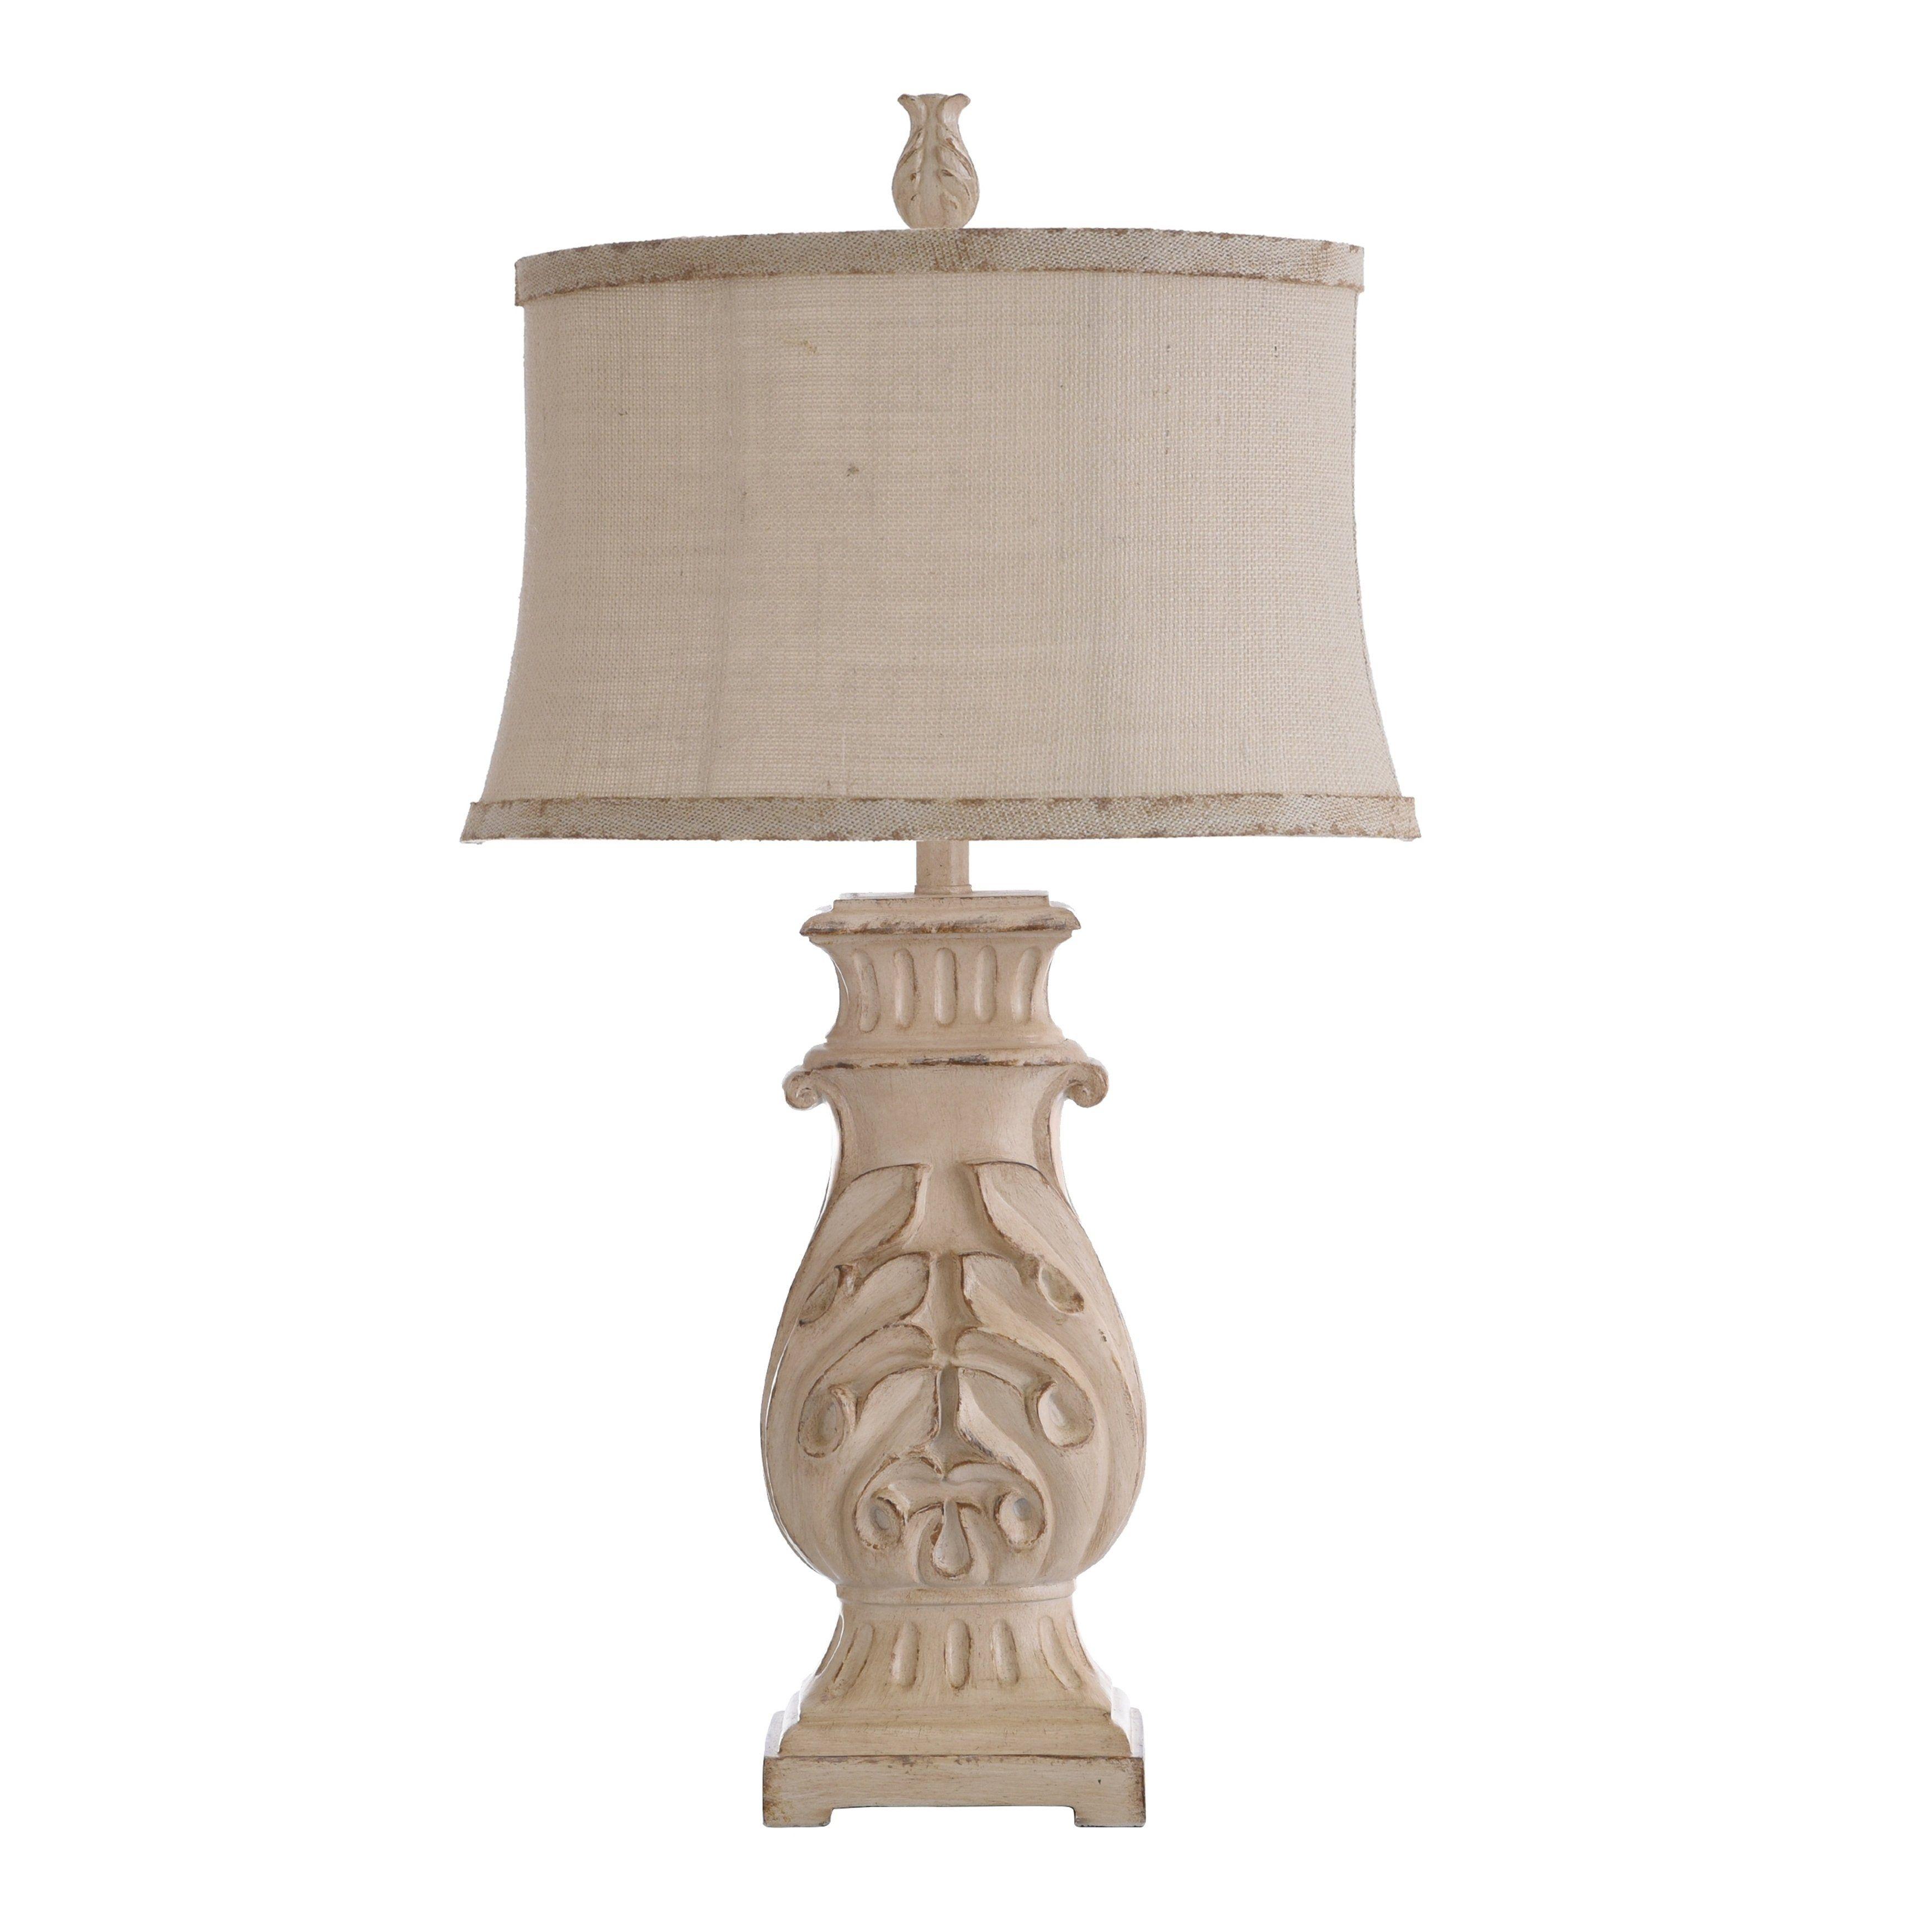 Bokava Distressed Antique White Table Lamp Beige Softback Fabric